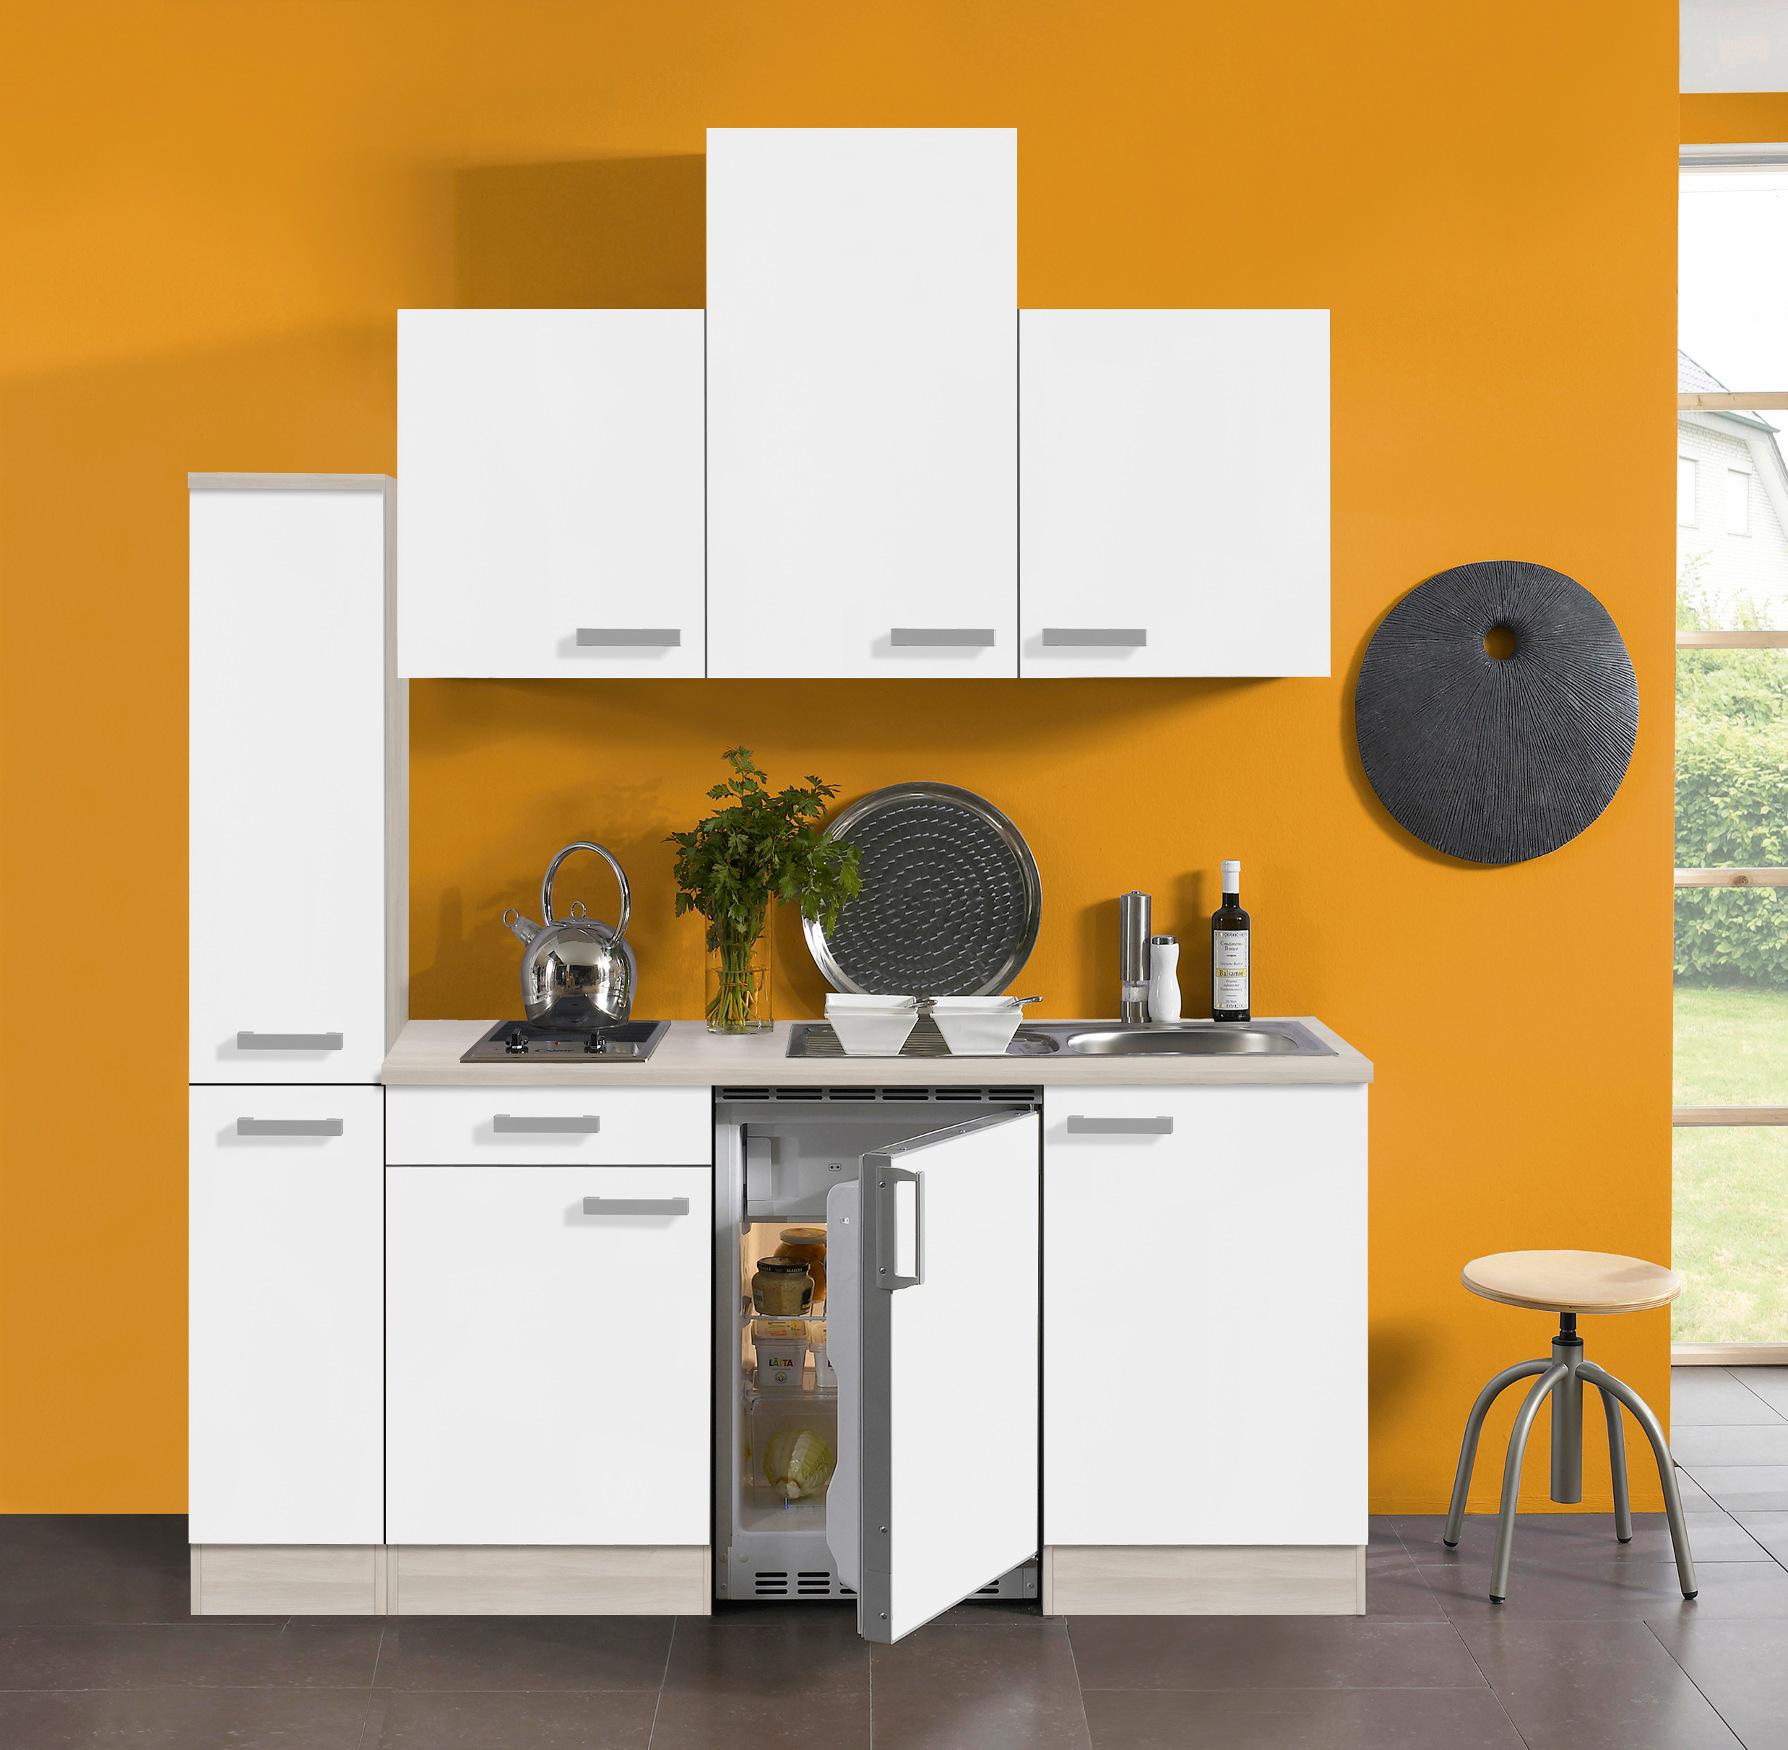 singlek che barcelona vario 2 glaskeramik kochfeld breite 180 cm wei k che singlek chen. Black Bedroom Furniture Sets. Home Design Ideas